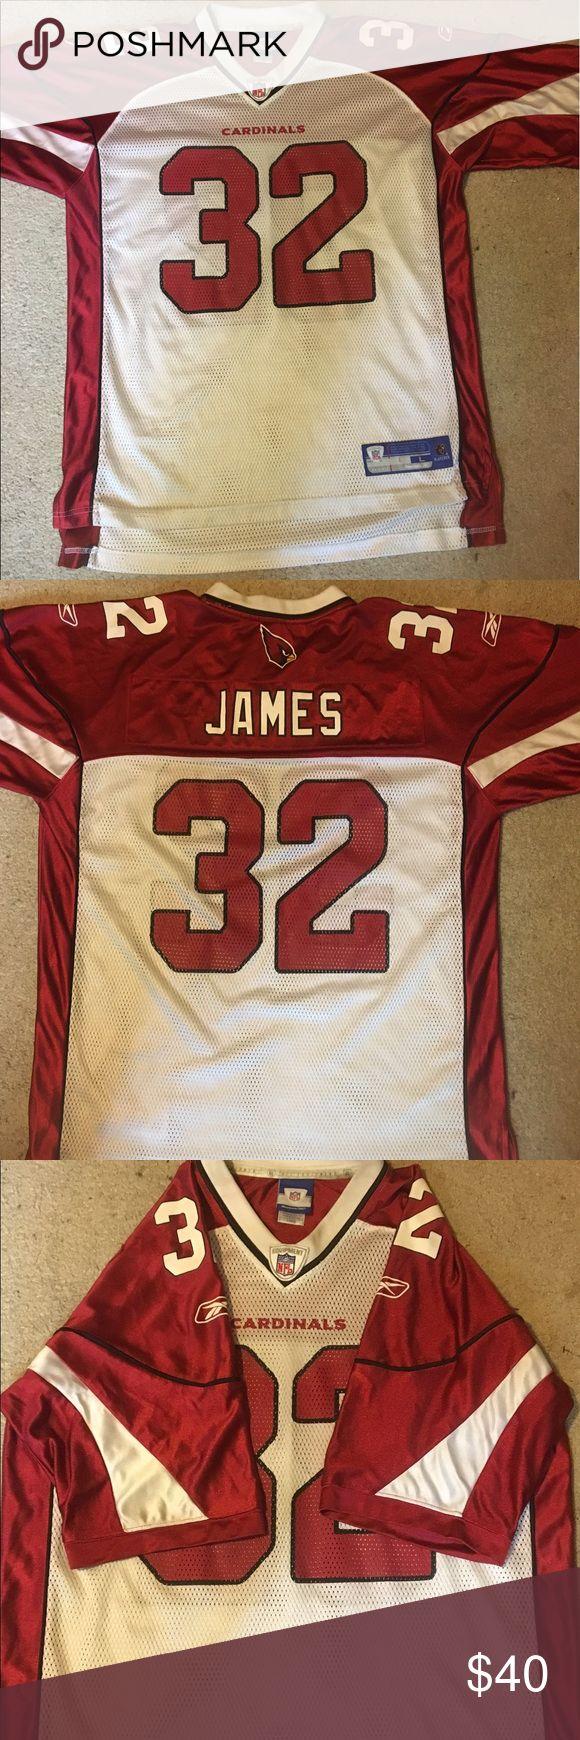 Edgerrin James Arizona Cardinals NFL Jersey Official NFL Merchandise by Reebok, brand new Reebok Other